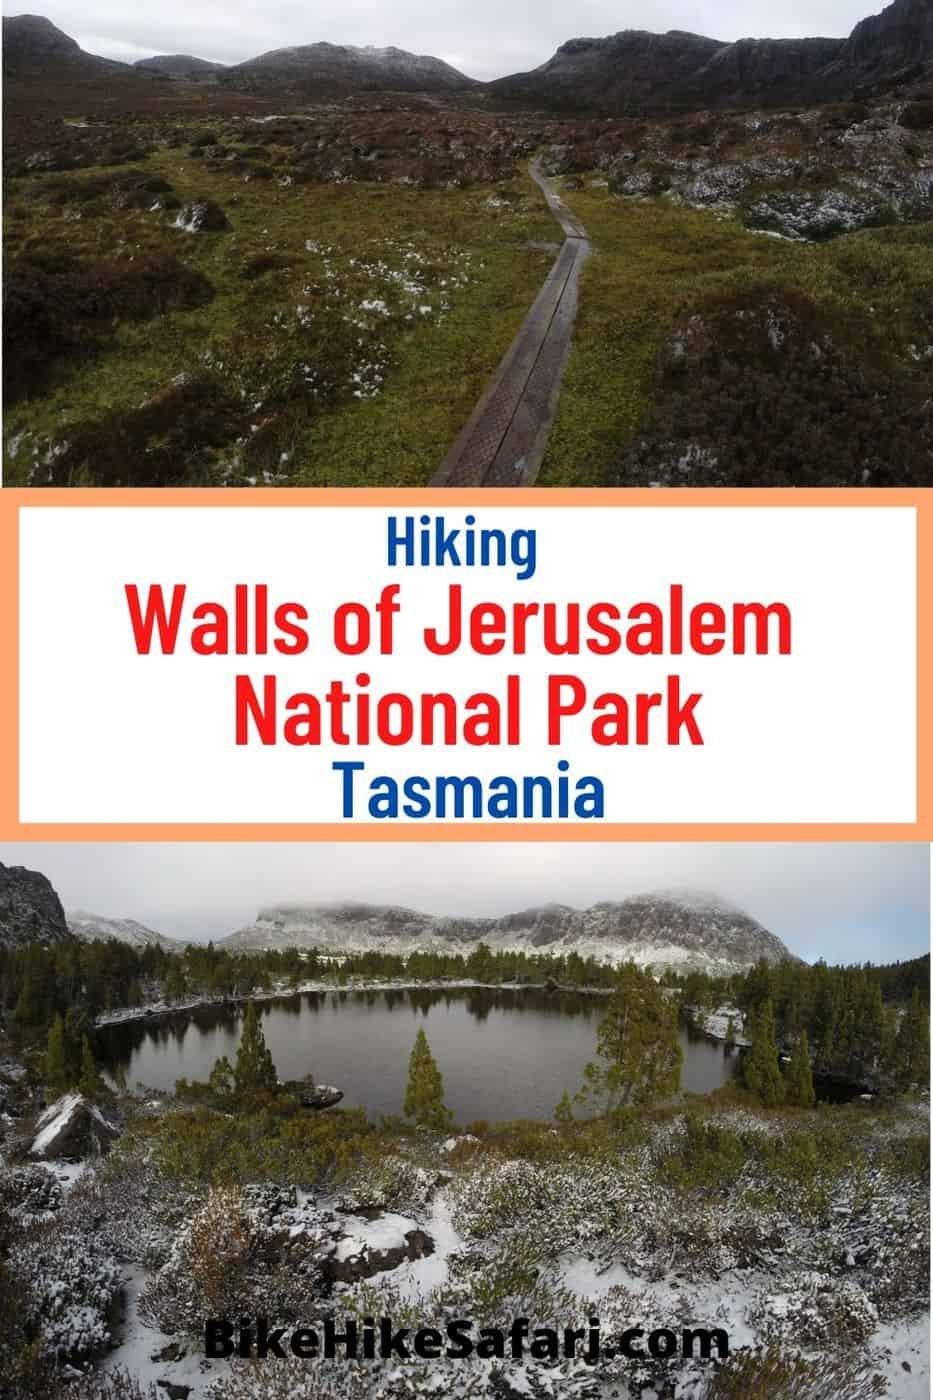 Hiking Walls of Jerusalem National Park Tasmania